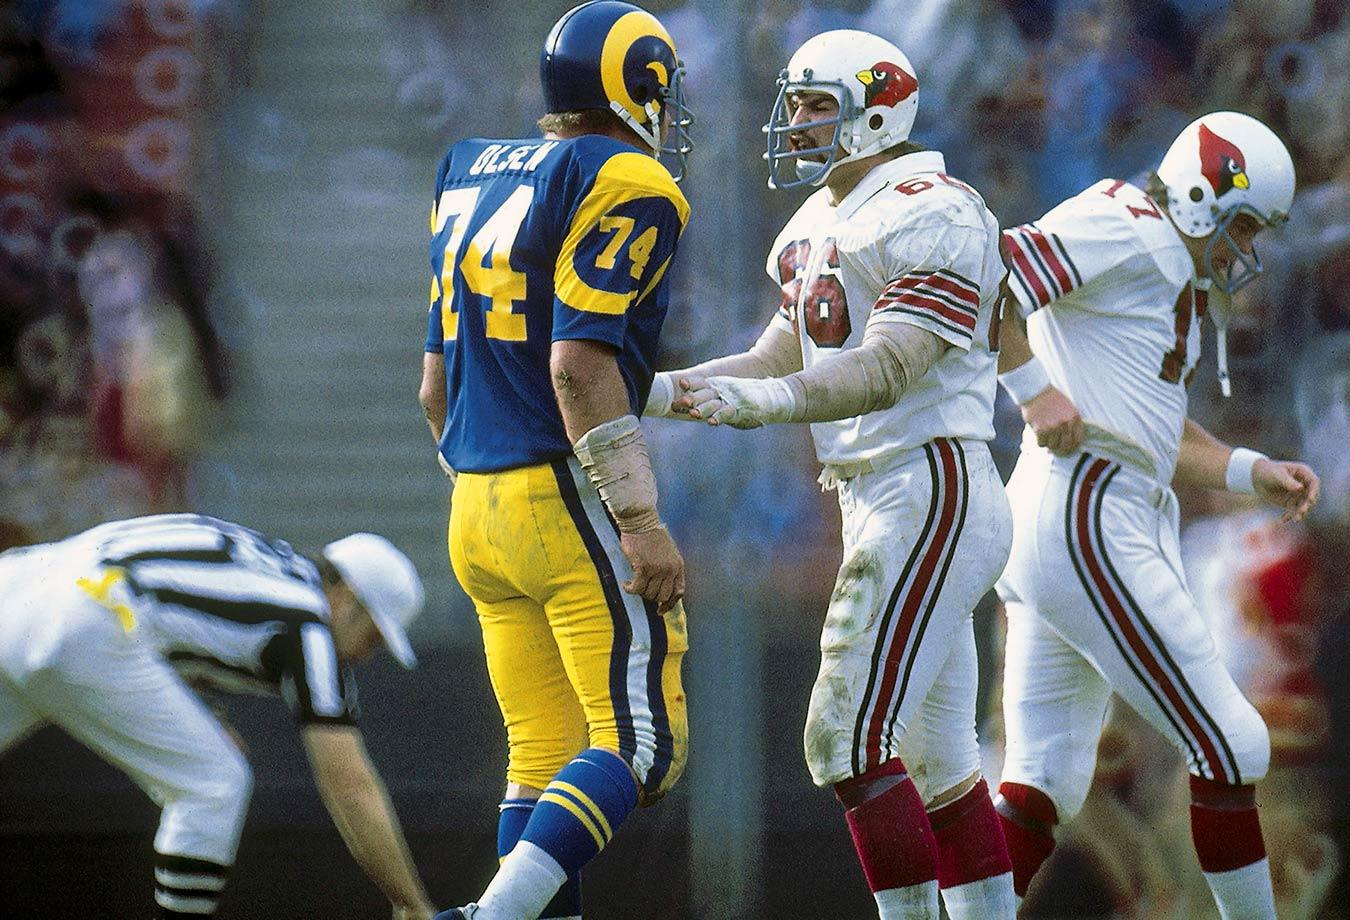 Dec. 27, 1975 — Los Angeles Rams vs. St. Louis Cardinals